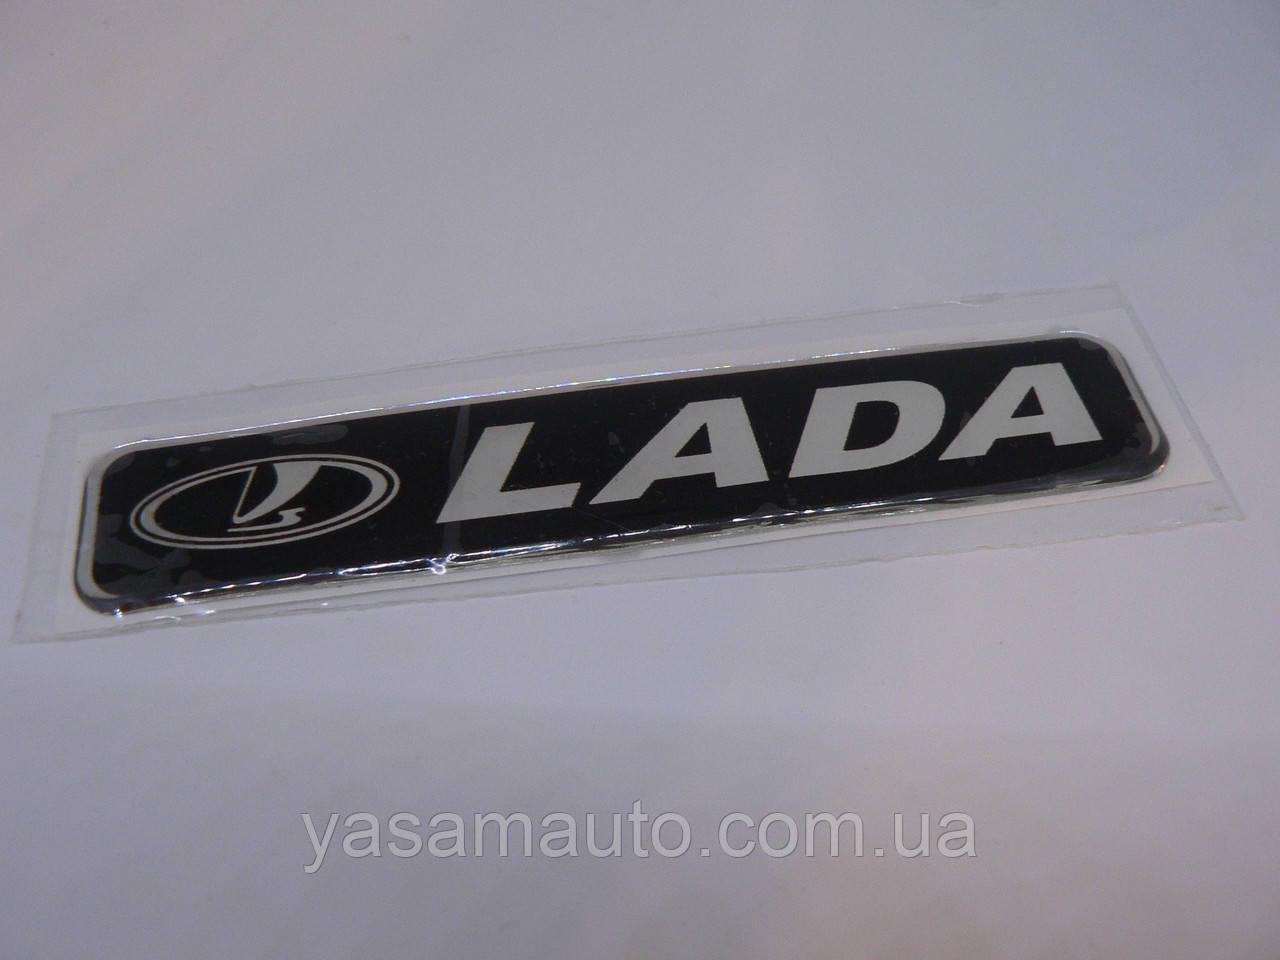 Наклейка s надпись Lada 100х20х1мм силиконовая на авто эмблема логотип Лада черный фон